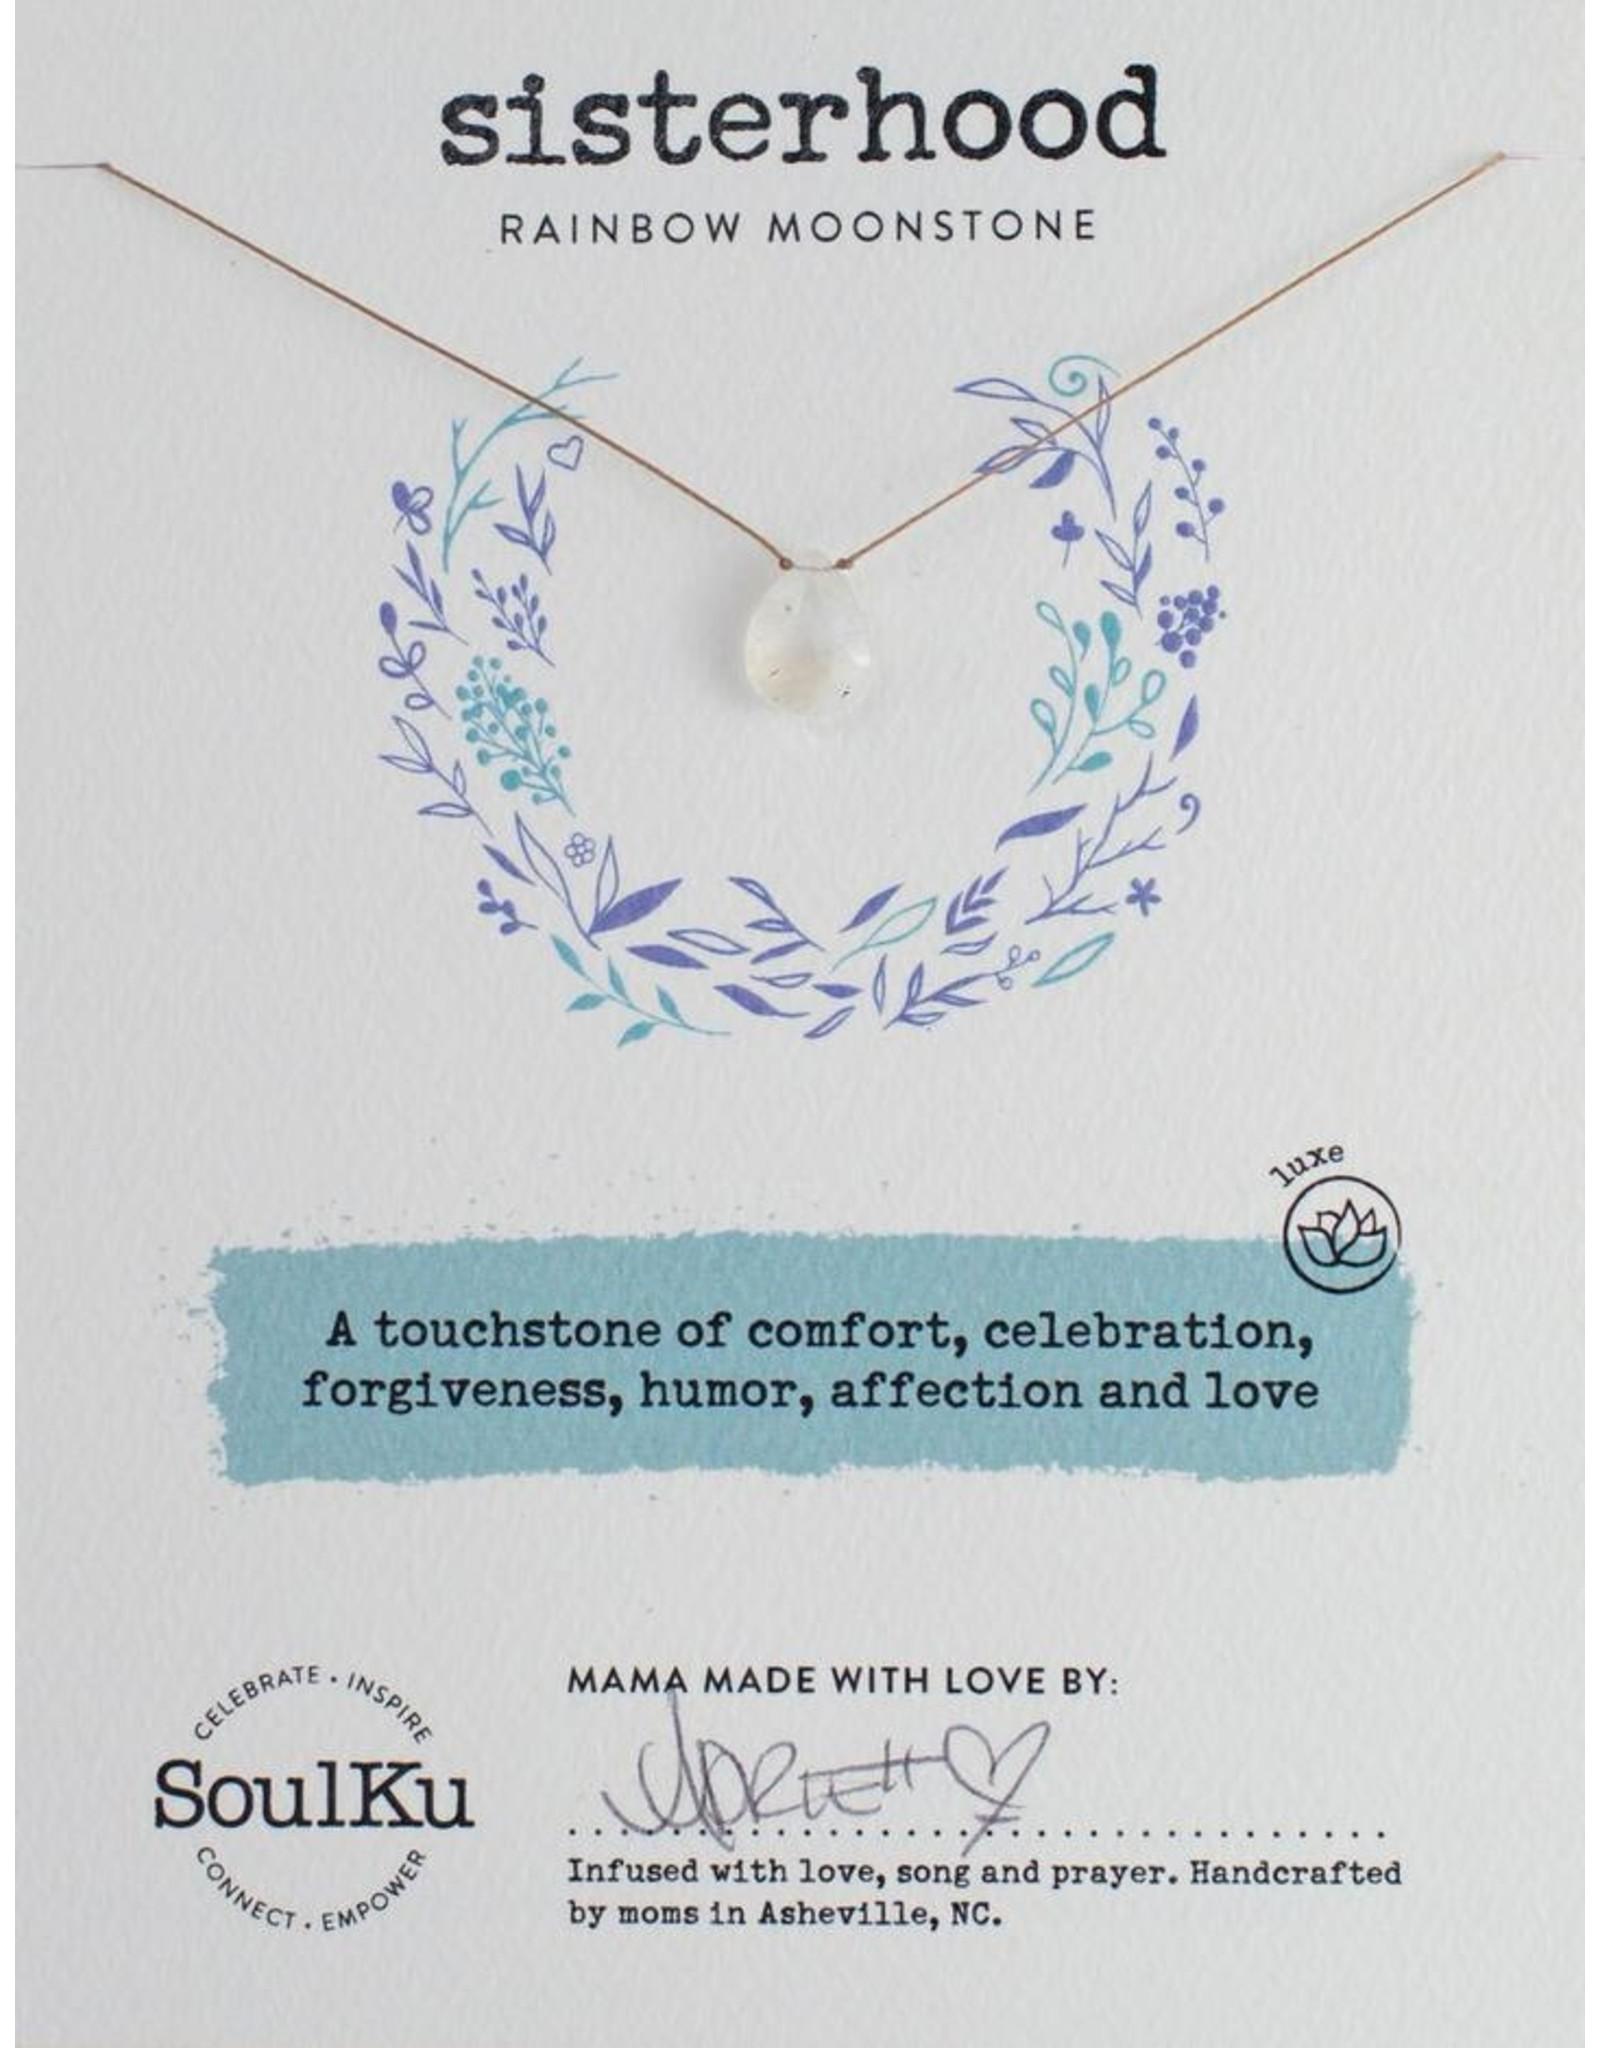 Rainbow Moonstone Necklace for Sisterhood-SoulKu